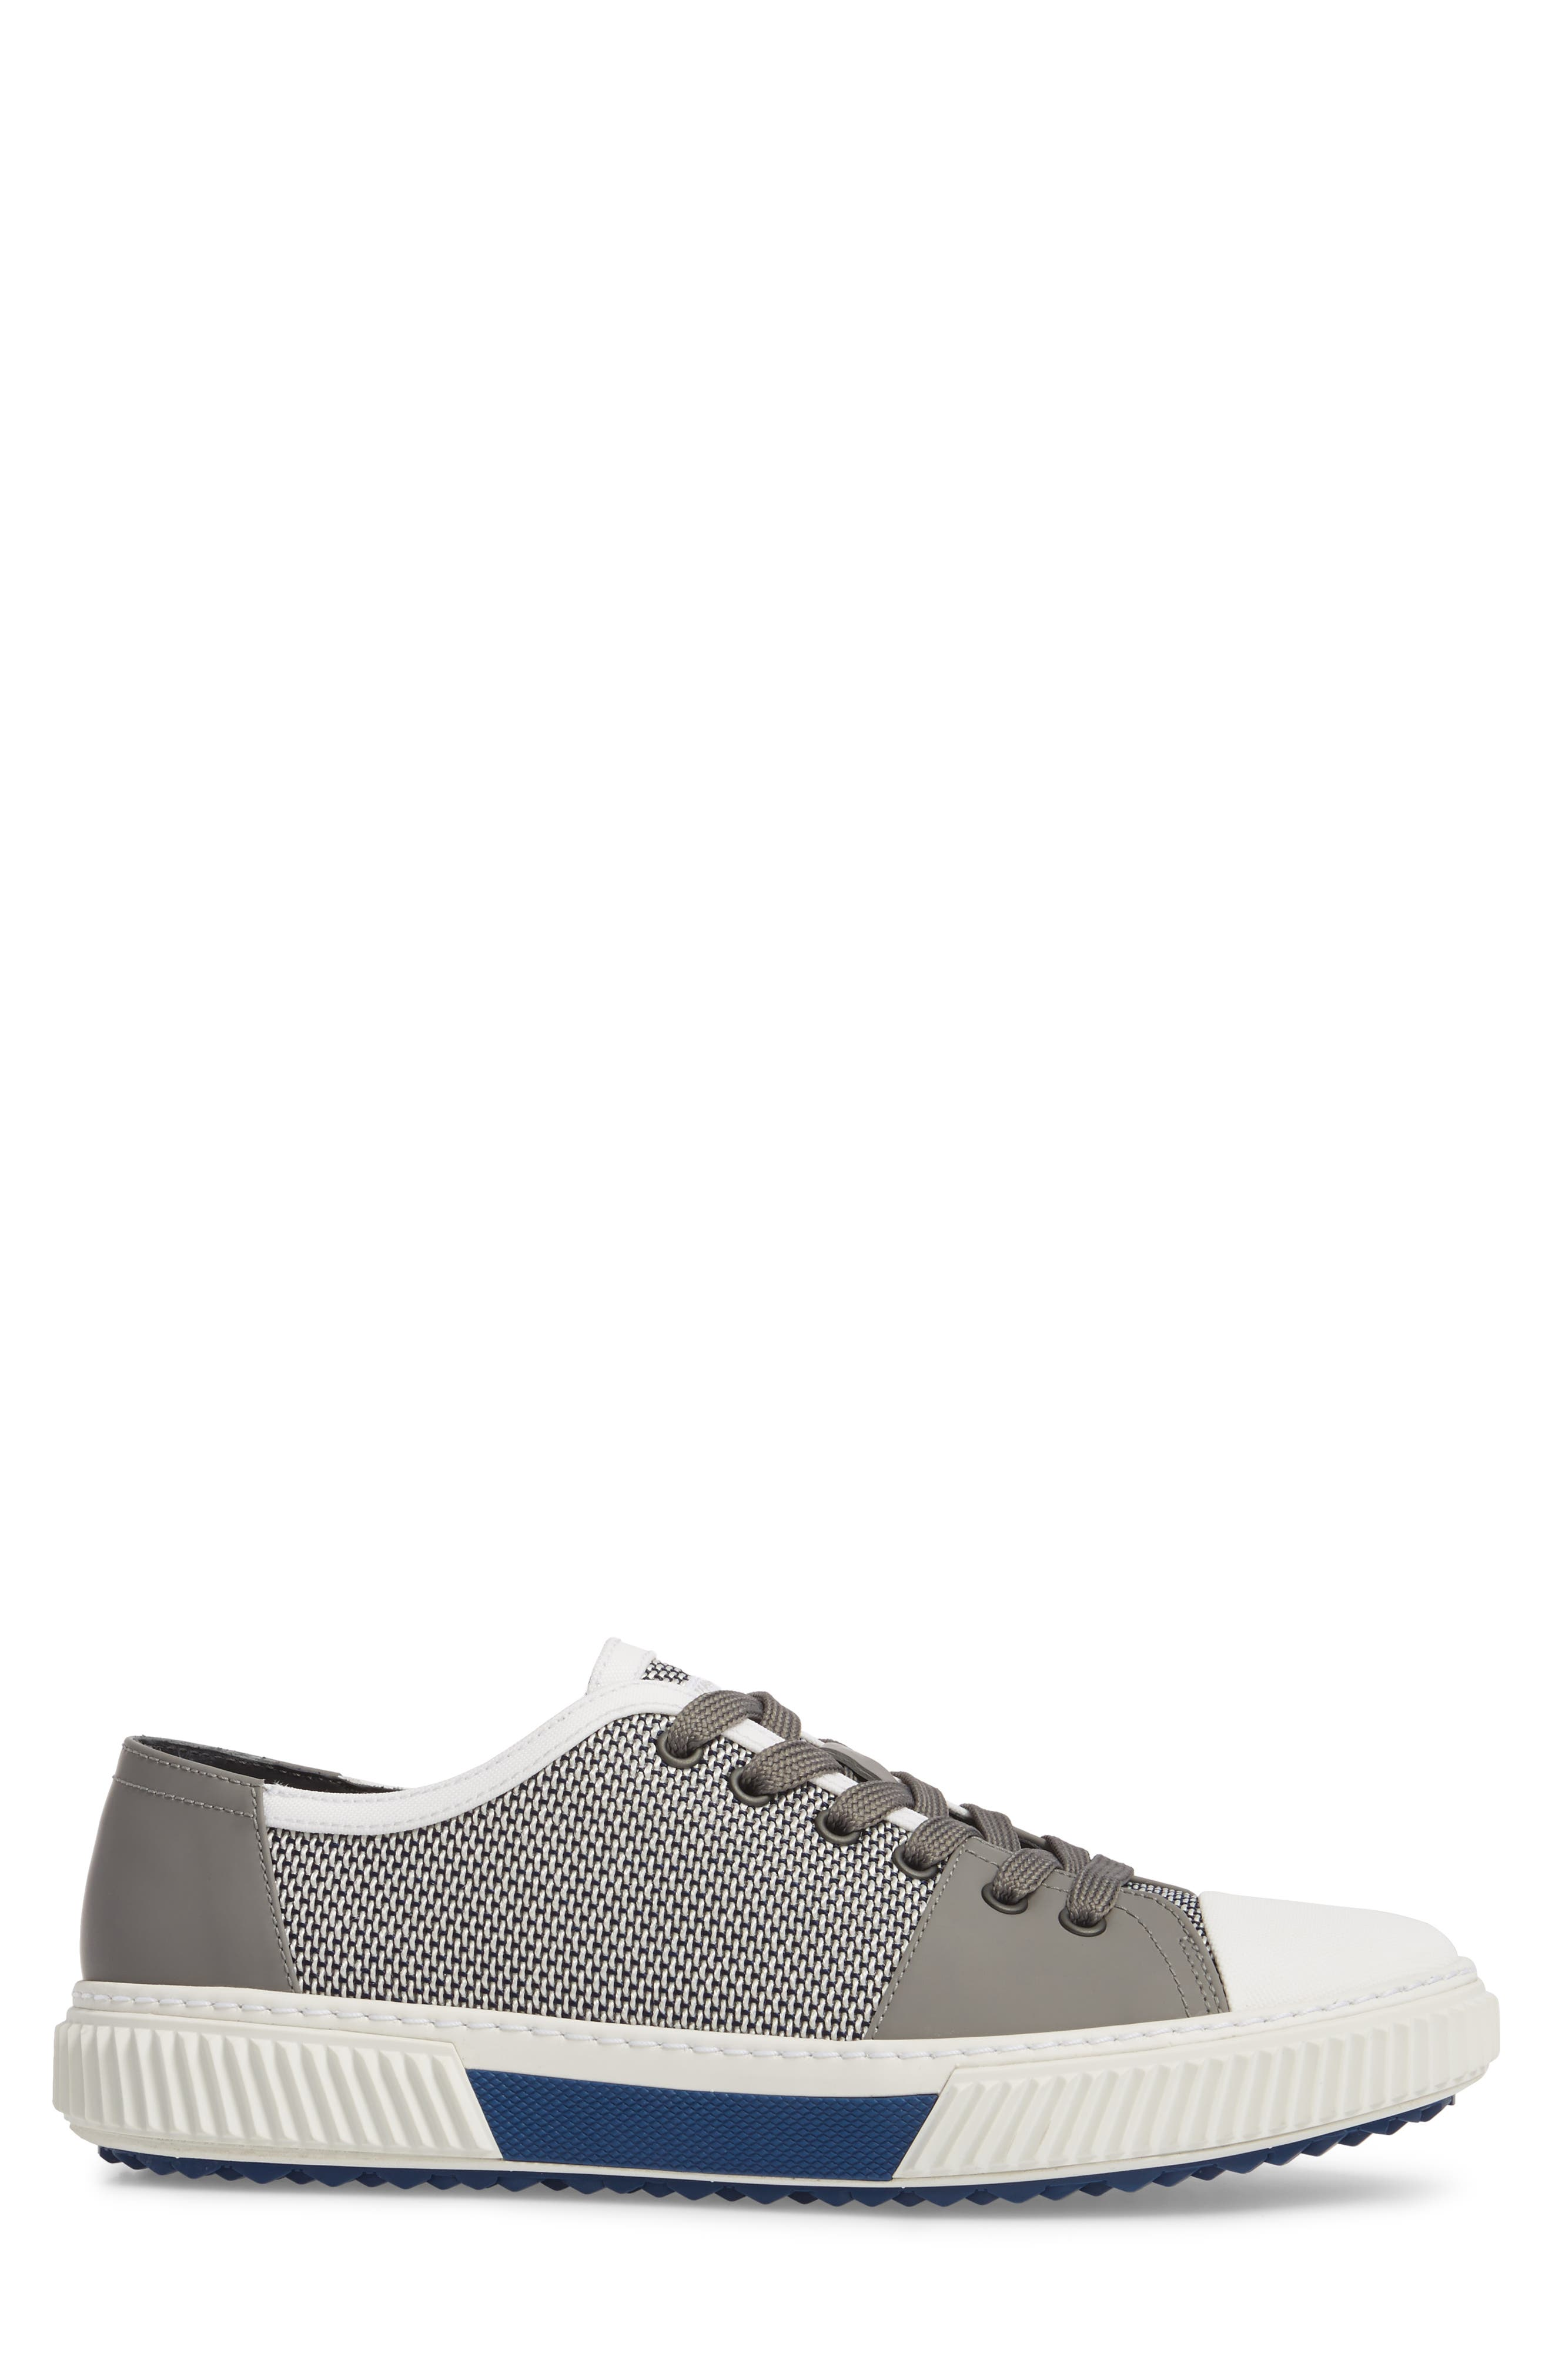 Linea Rossa Low-Top Sneaker,                             Alternate thumbnail 3, color,                             Baltic White